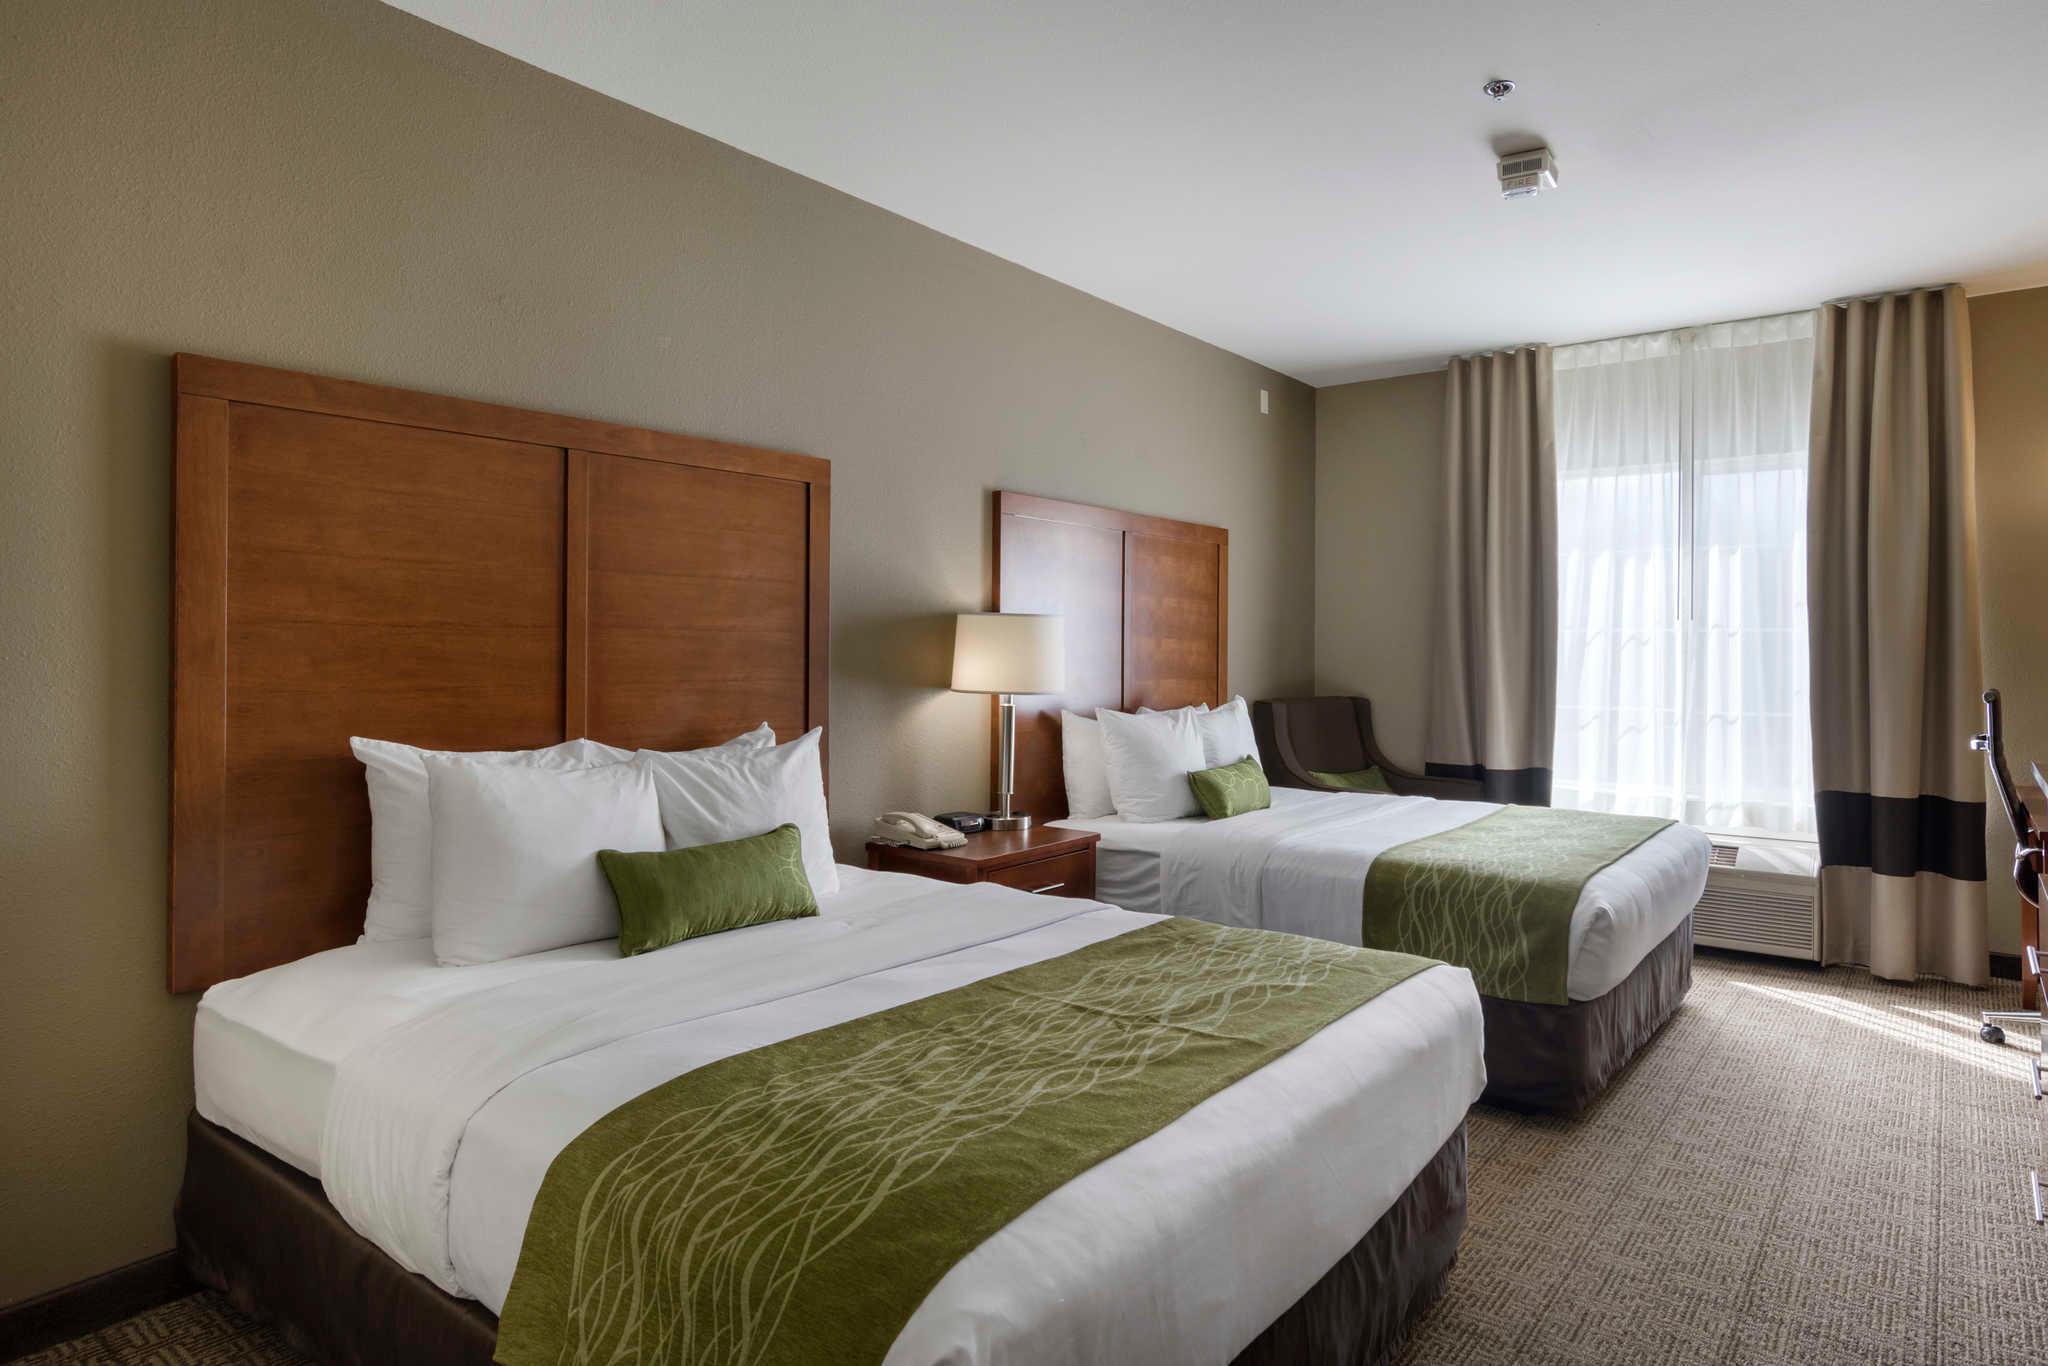 Comfort Inn & Suites Sacramento - University Area image 13